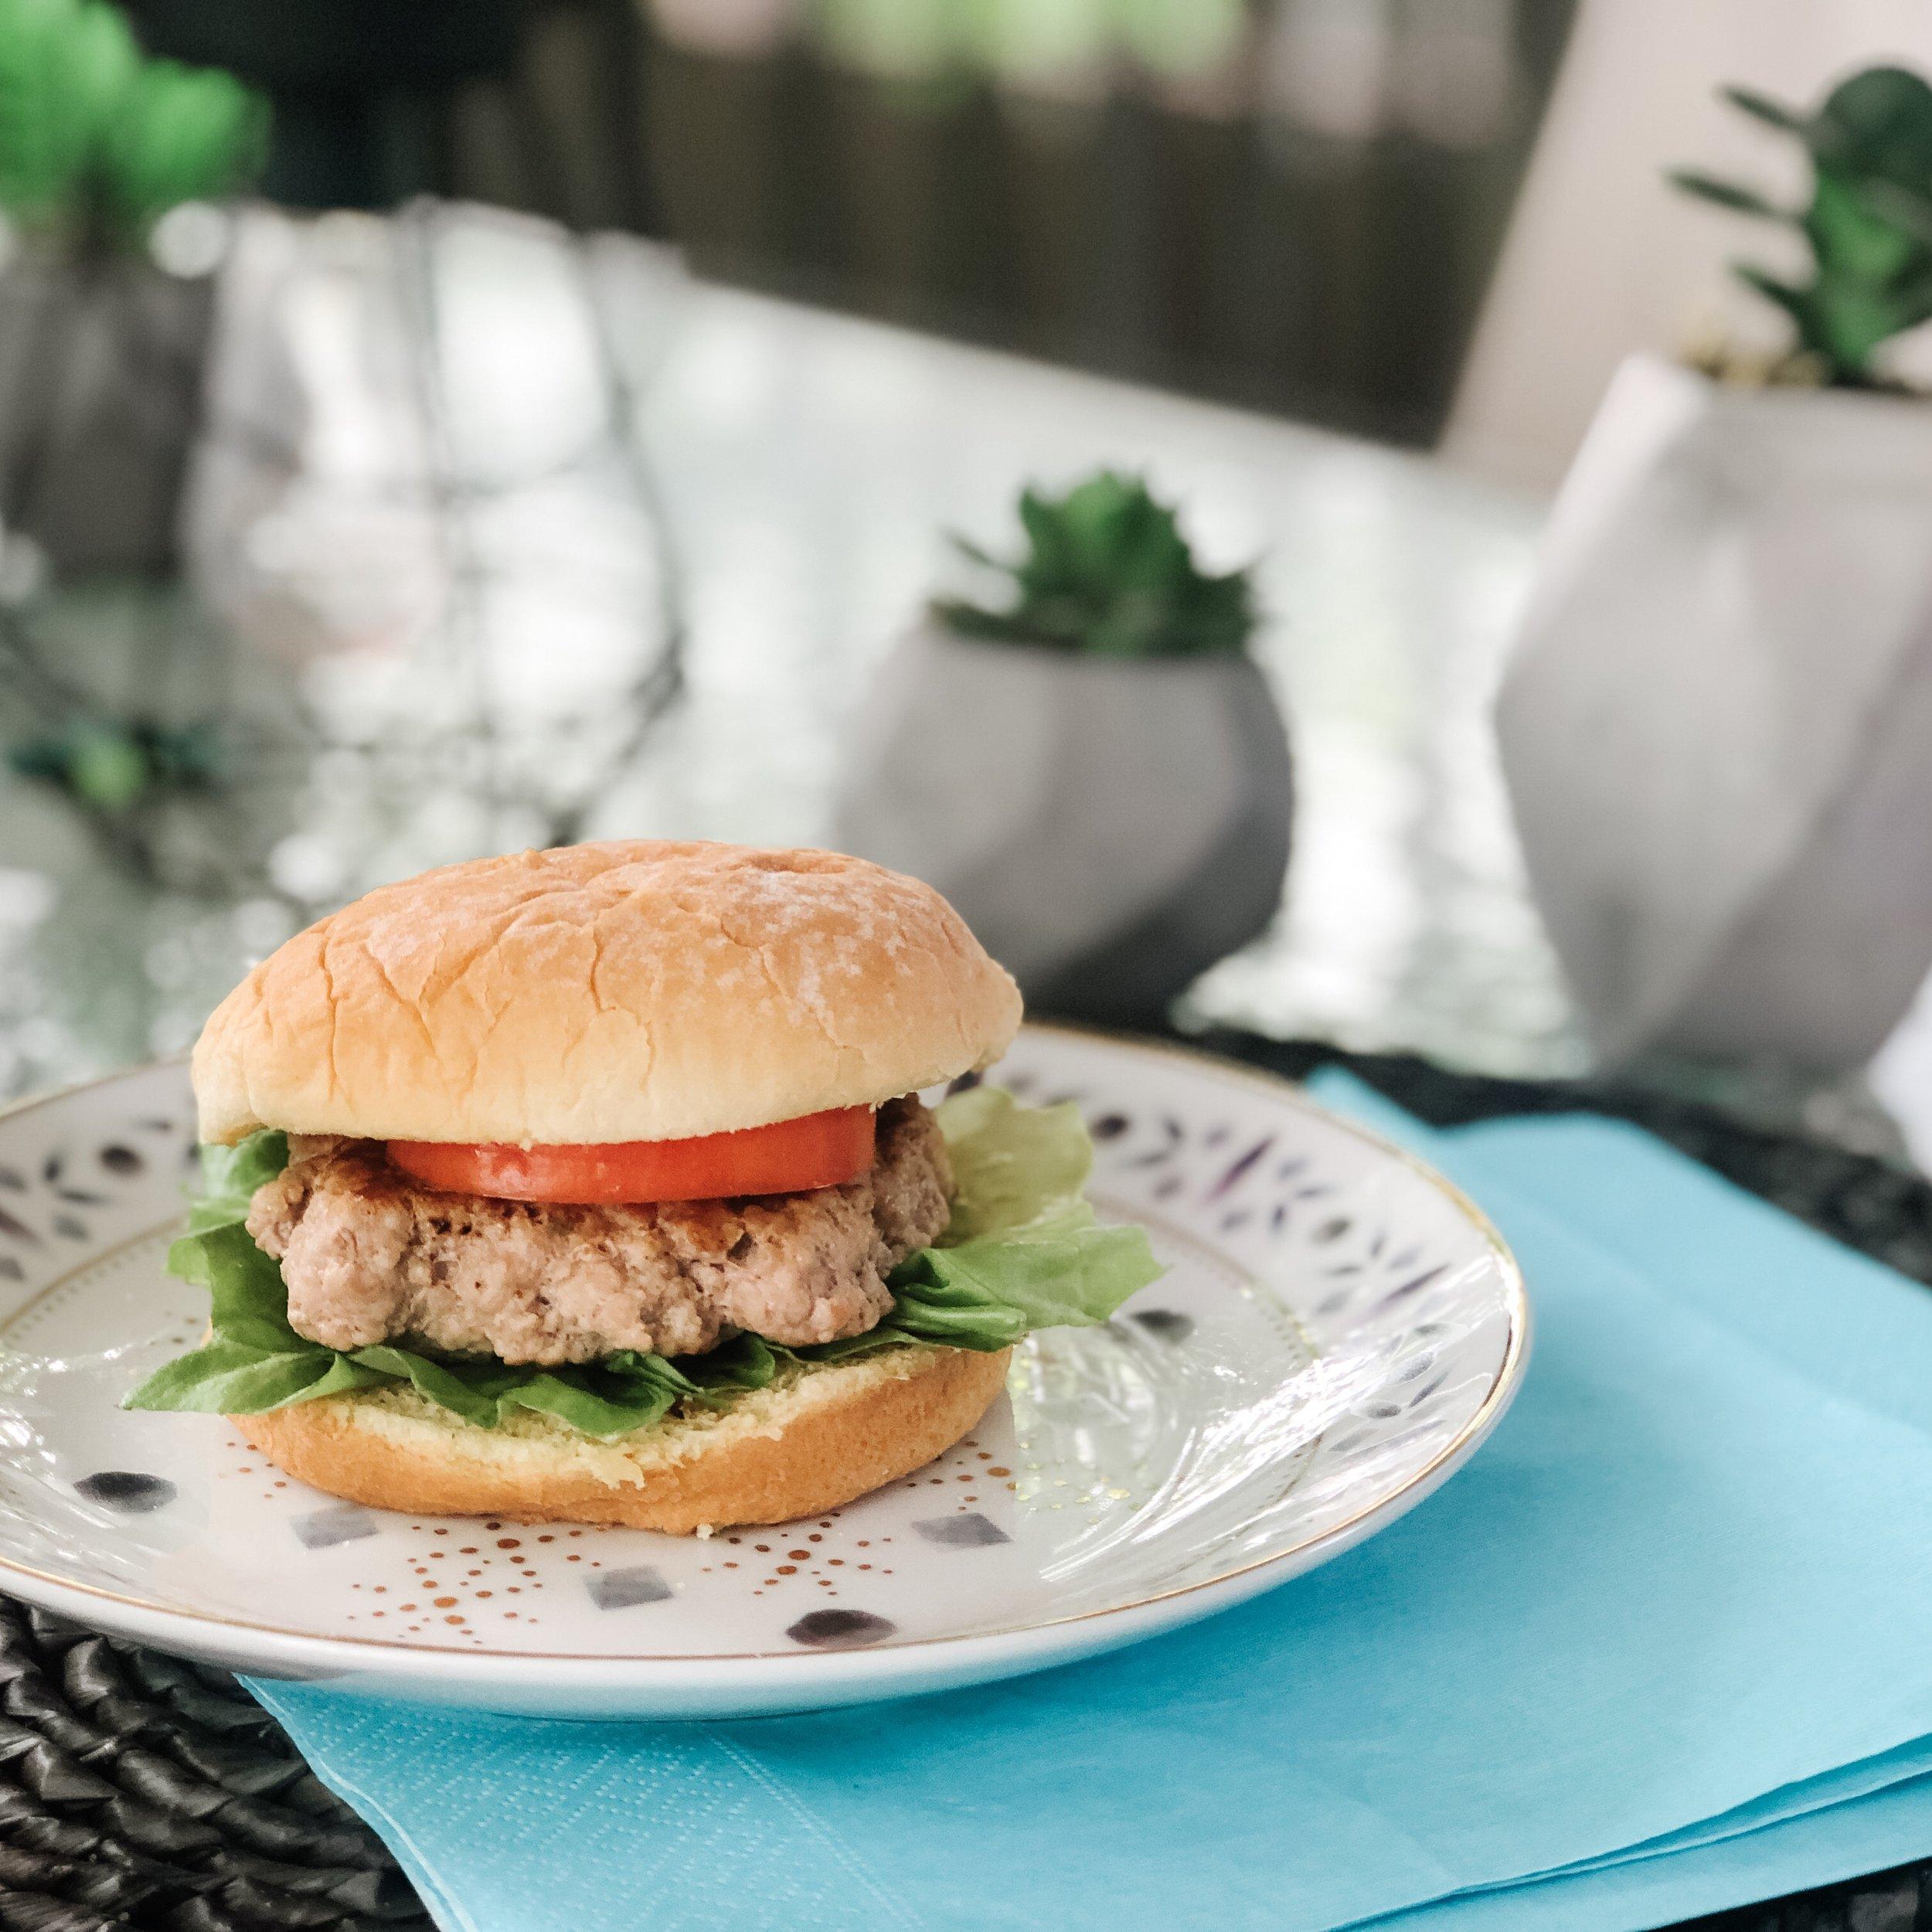 burger-burger à la dinde-bbq-recette bbq-turkey burger